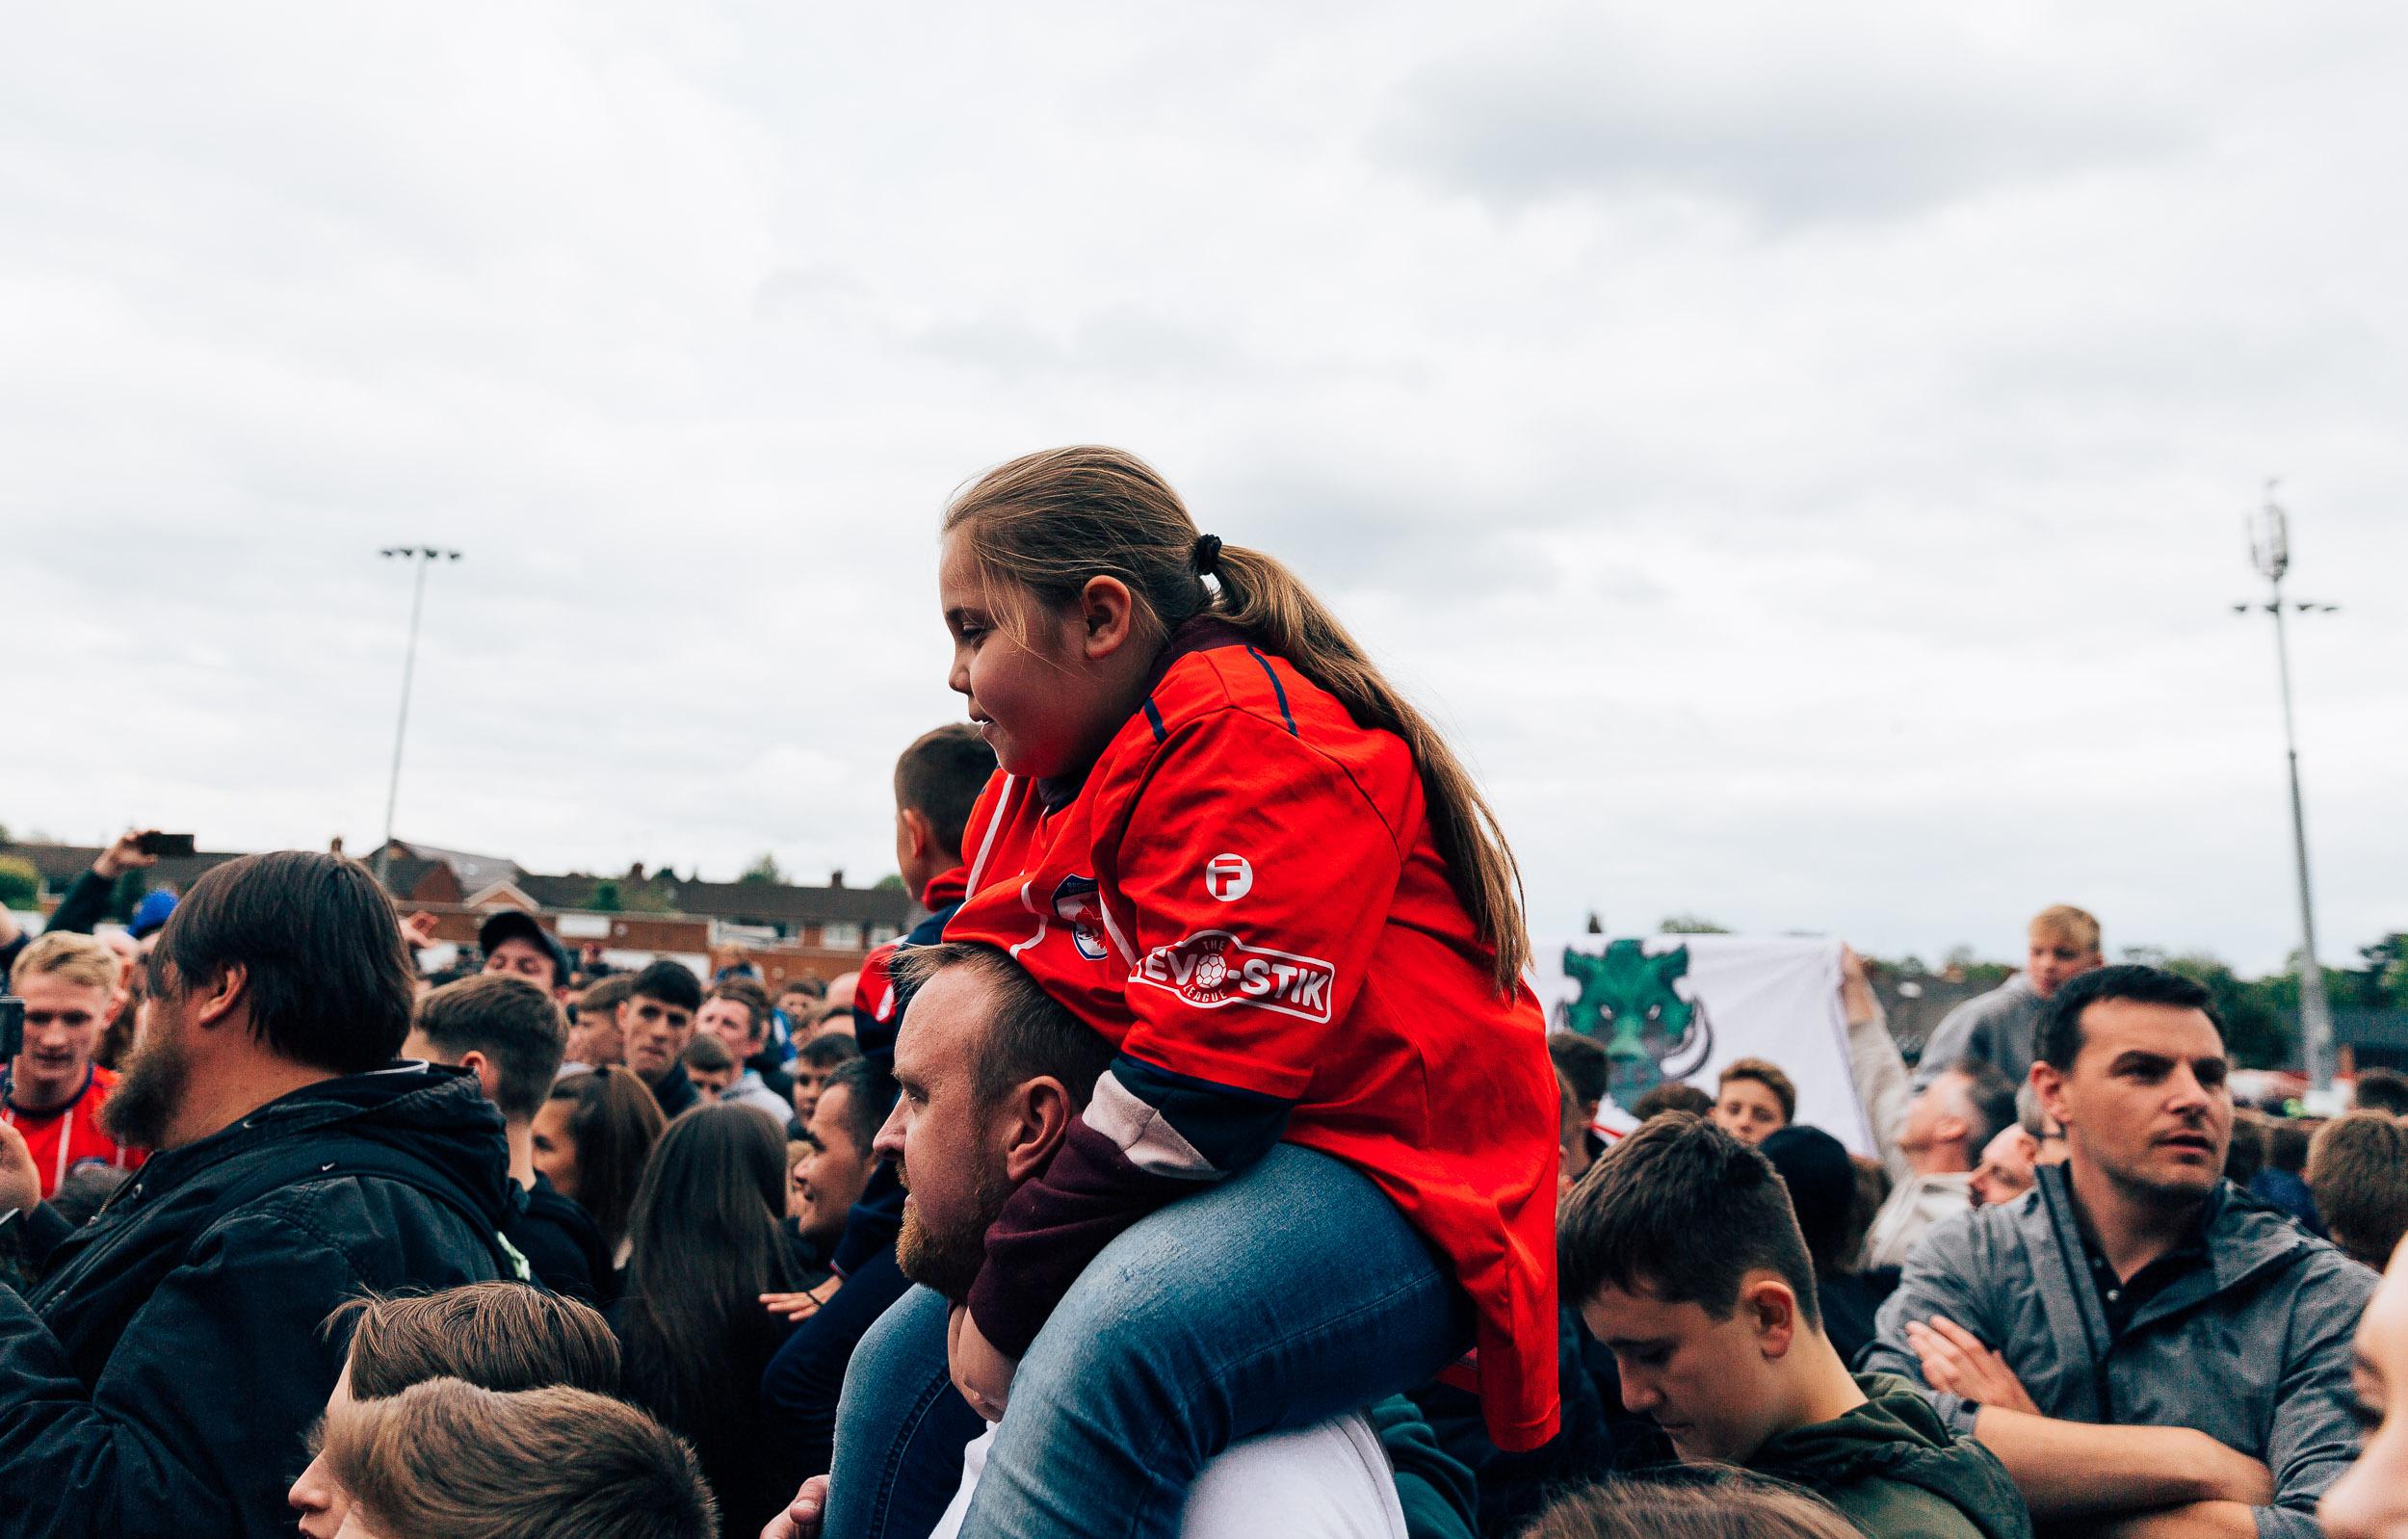 06_05_2019_Bromsgrove_Sporting_Corby-201.jpg